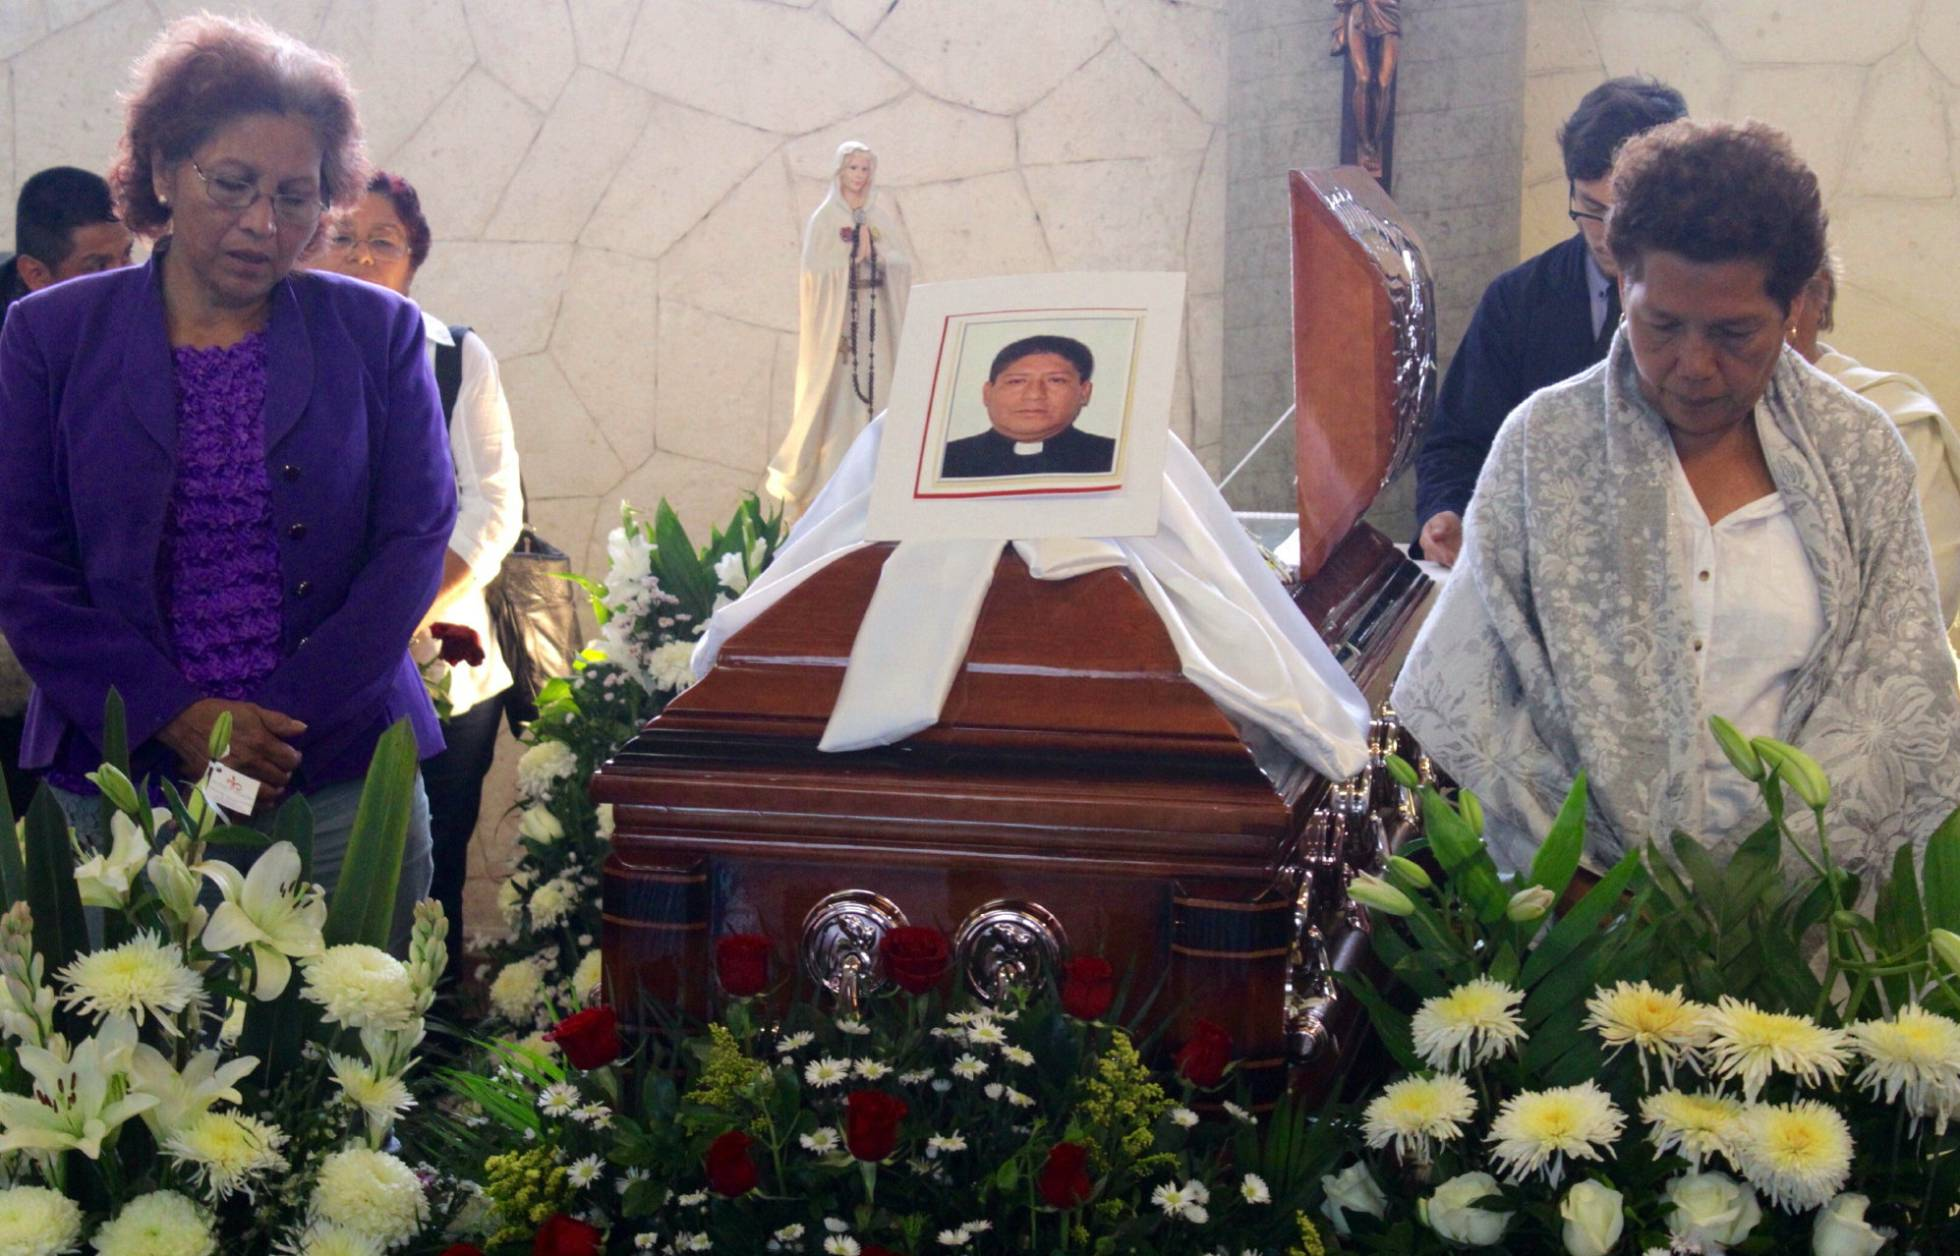 Detienen a presunto asesino de sacerdotes en Veracruz